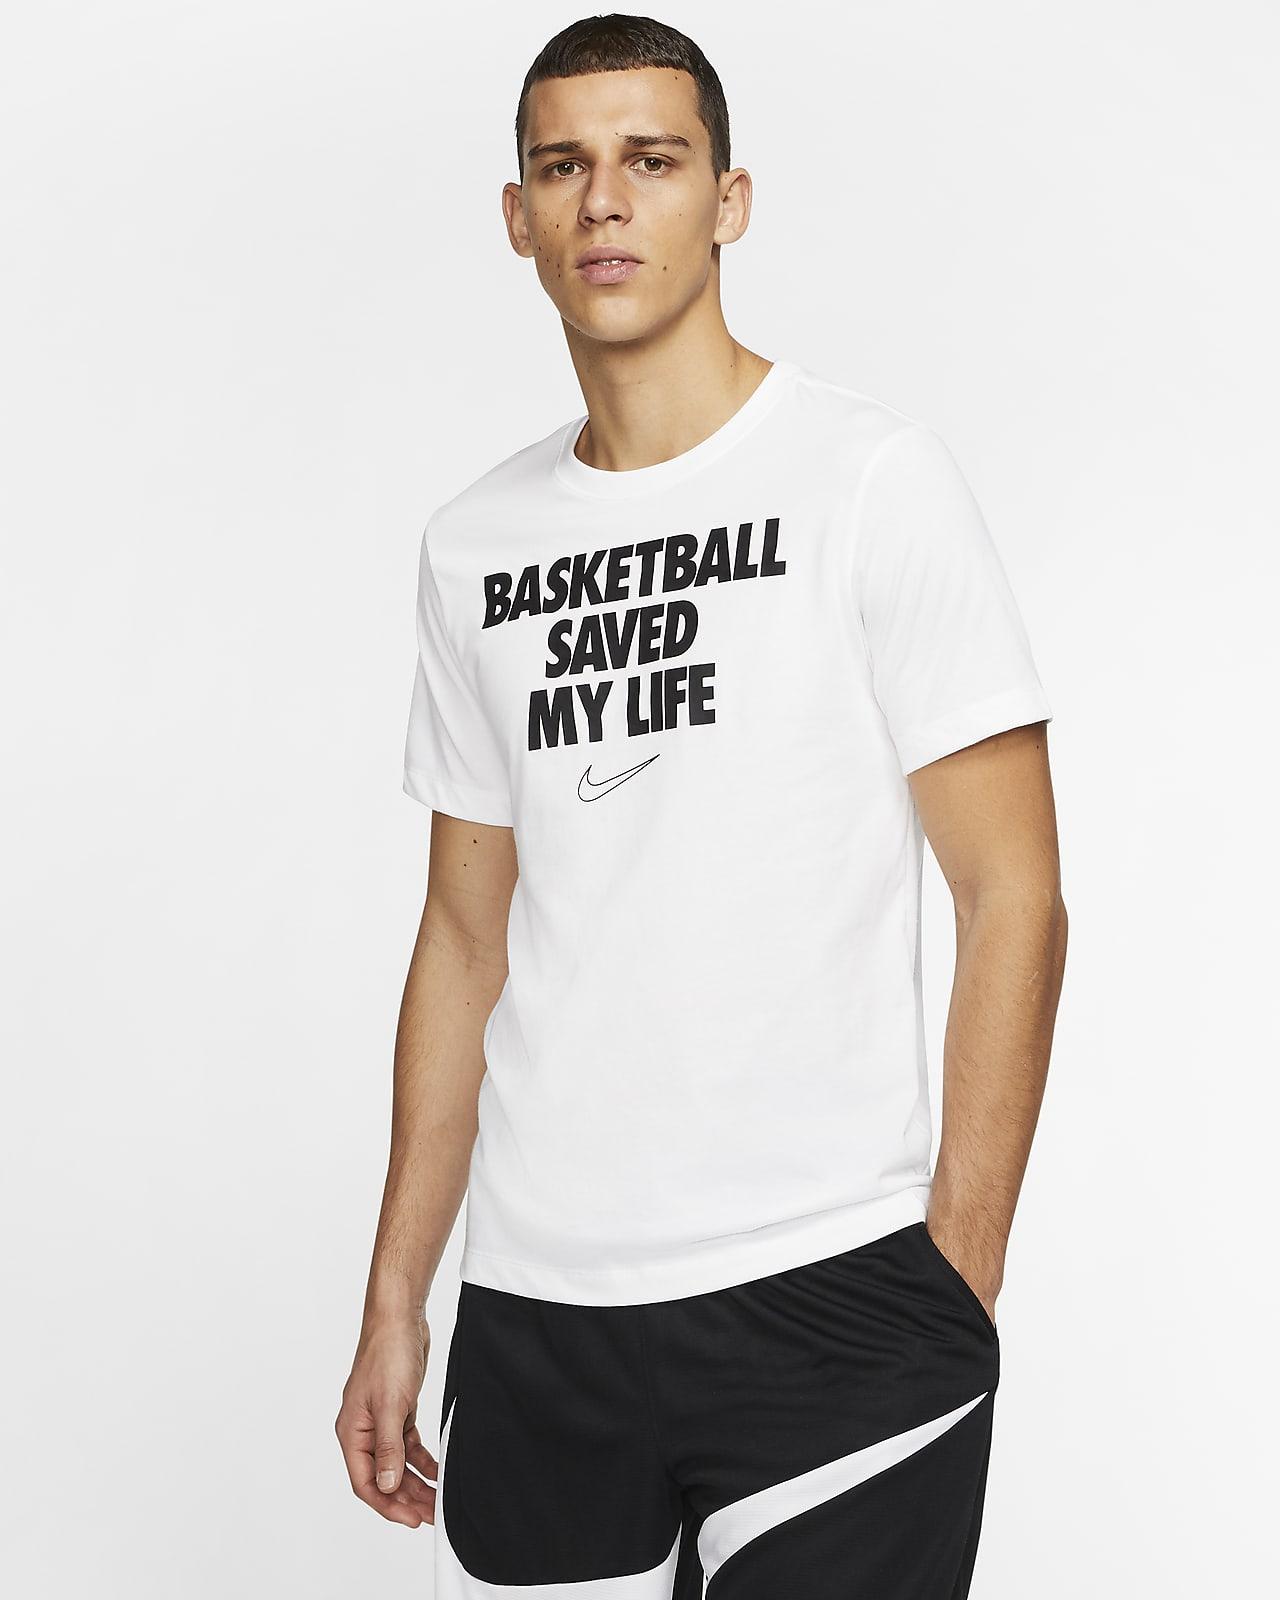 Nike Dri-FIT 'My Life' Men's Basketball T-Shirt